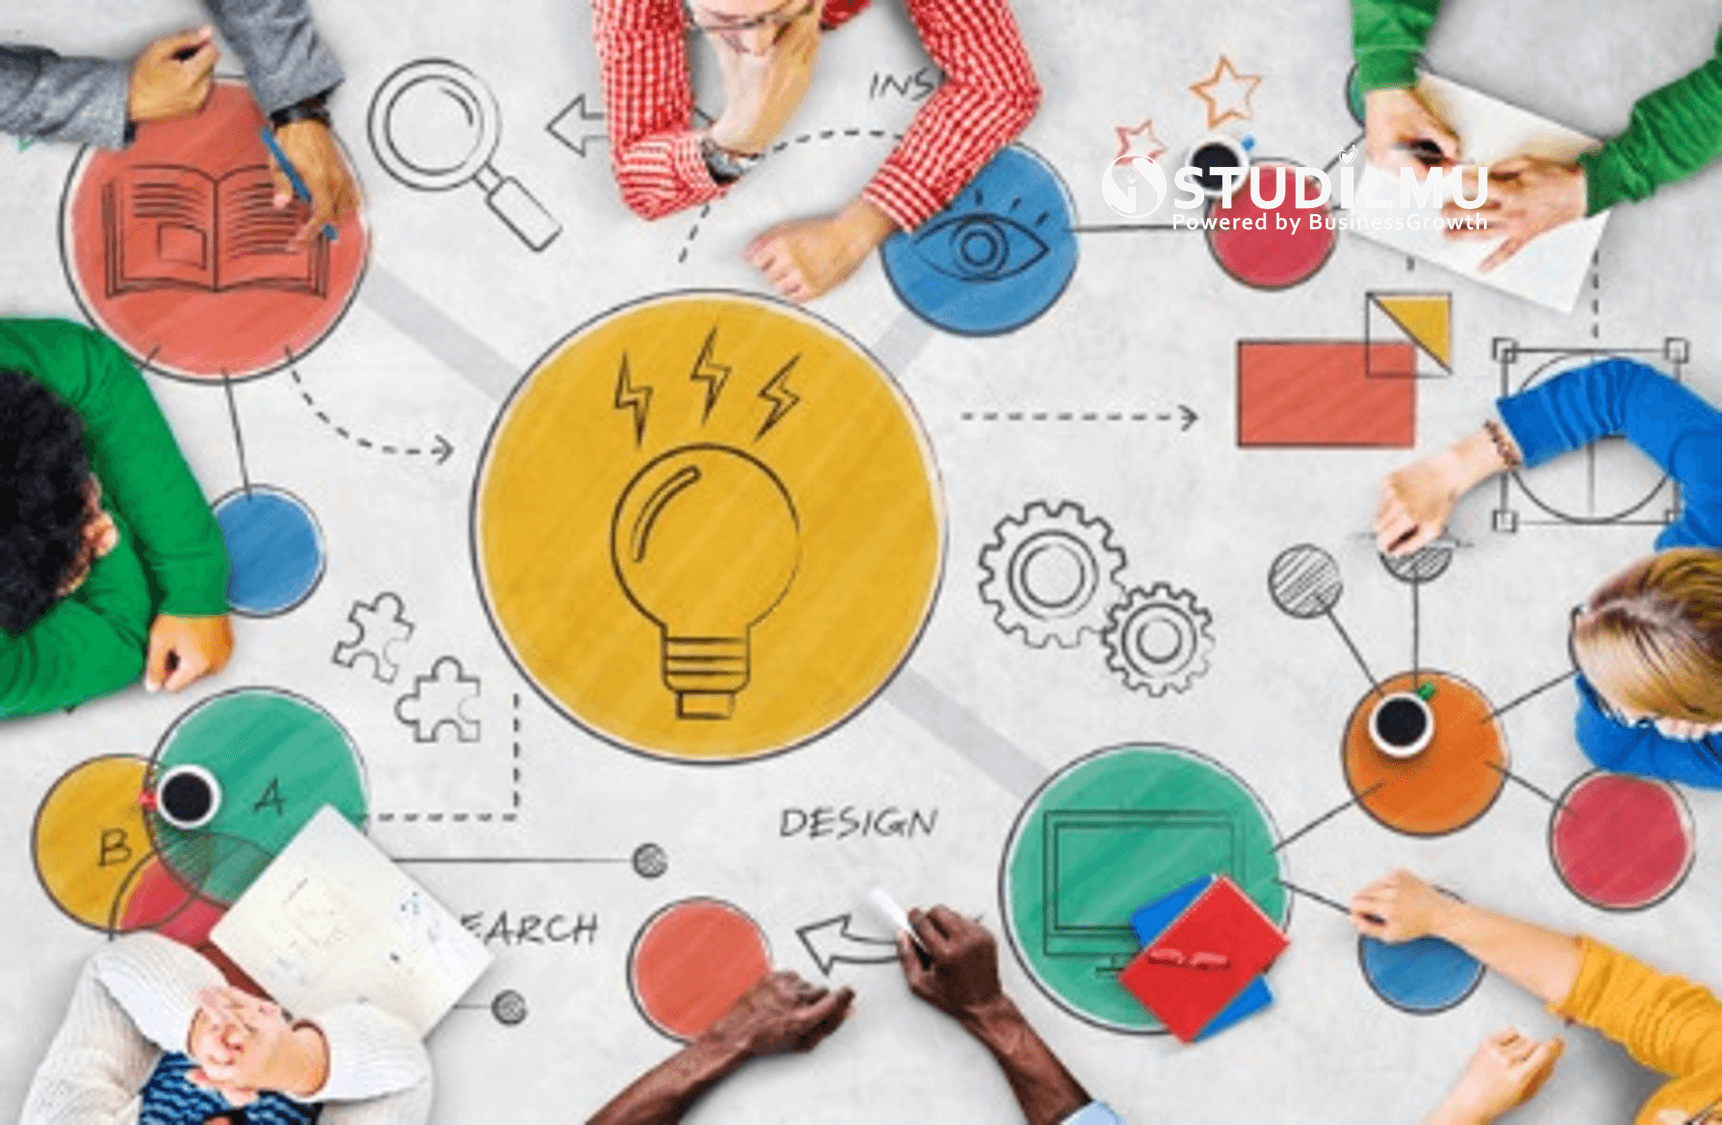 STUDILMU Career Advice - 8 Ciri Tim yang Kreatif dan Inovatif